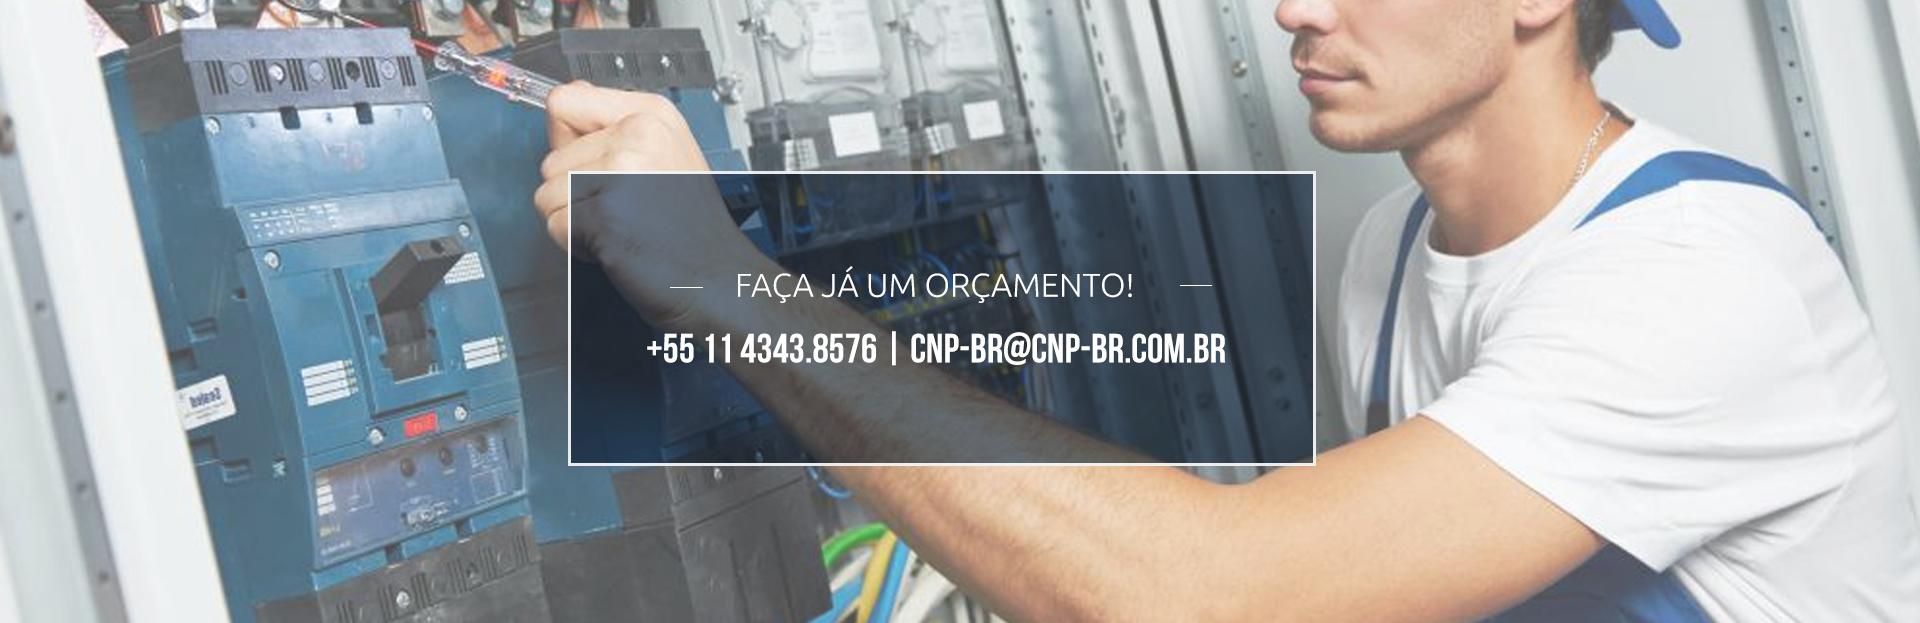 instalacao-eletrica-cnp-br-banner